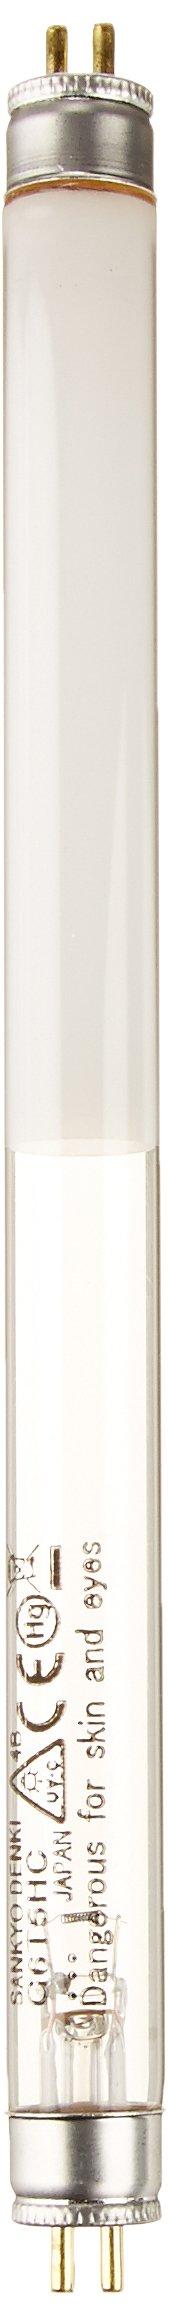 UVP 34-0015-01 Replacement UV Tube for Handheld UV Lamps, 8.3'' Length, 254nm Shortwave/365nm Longwave, 6W